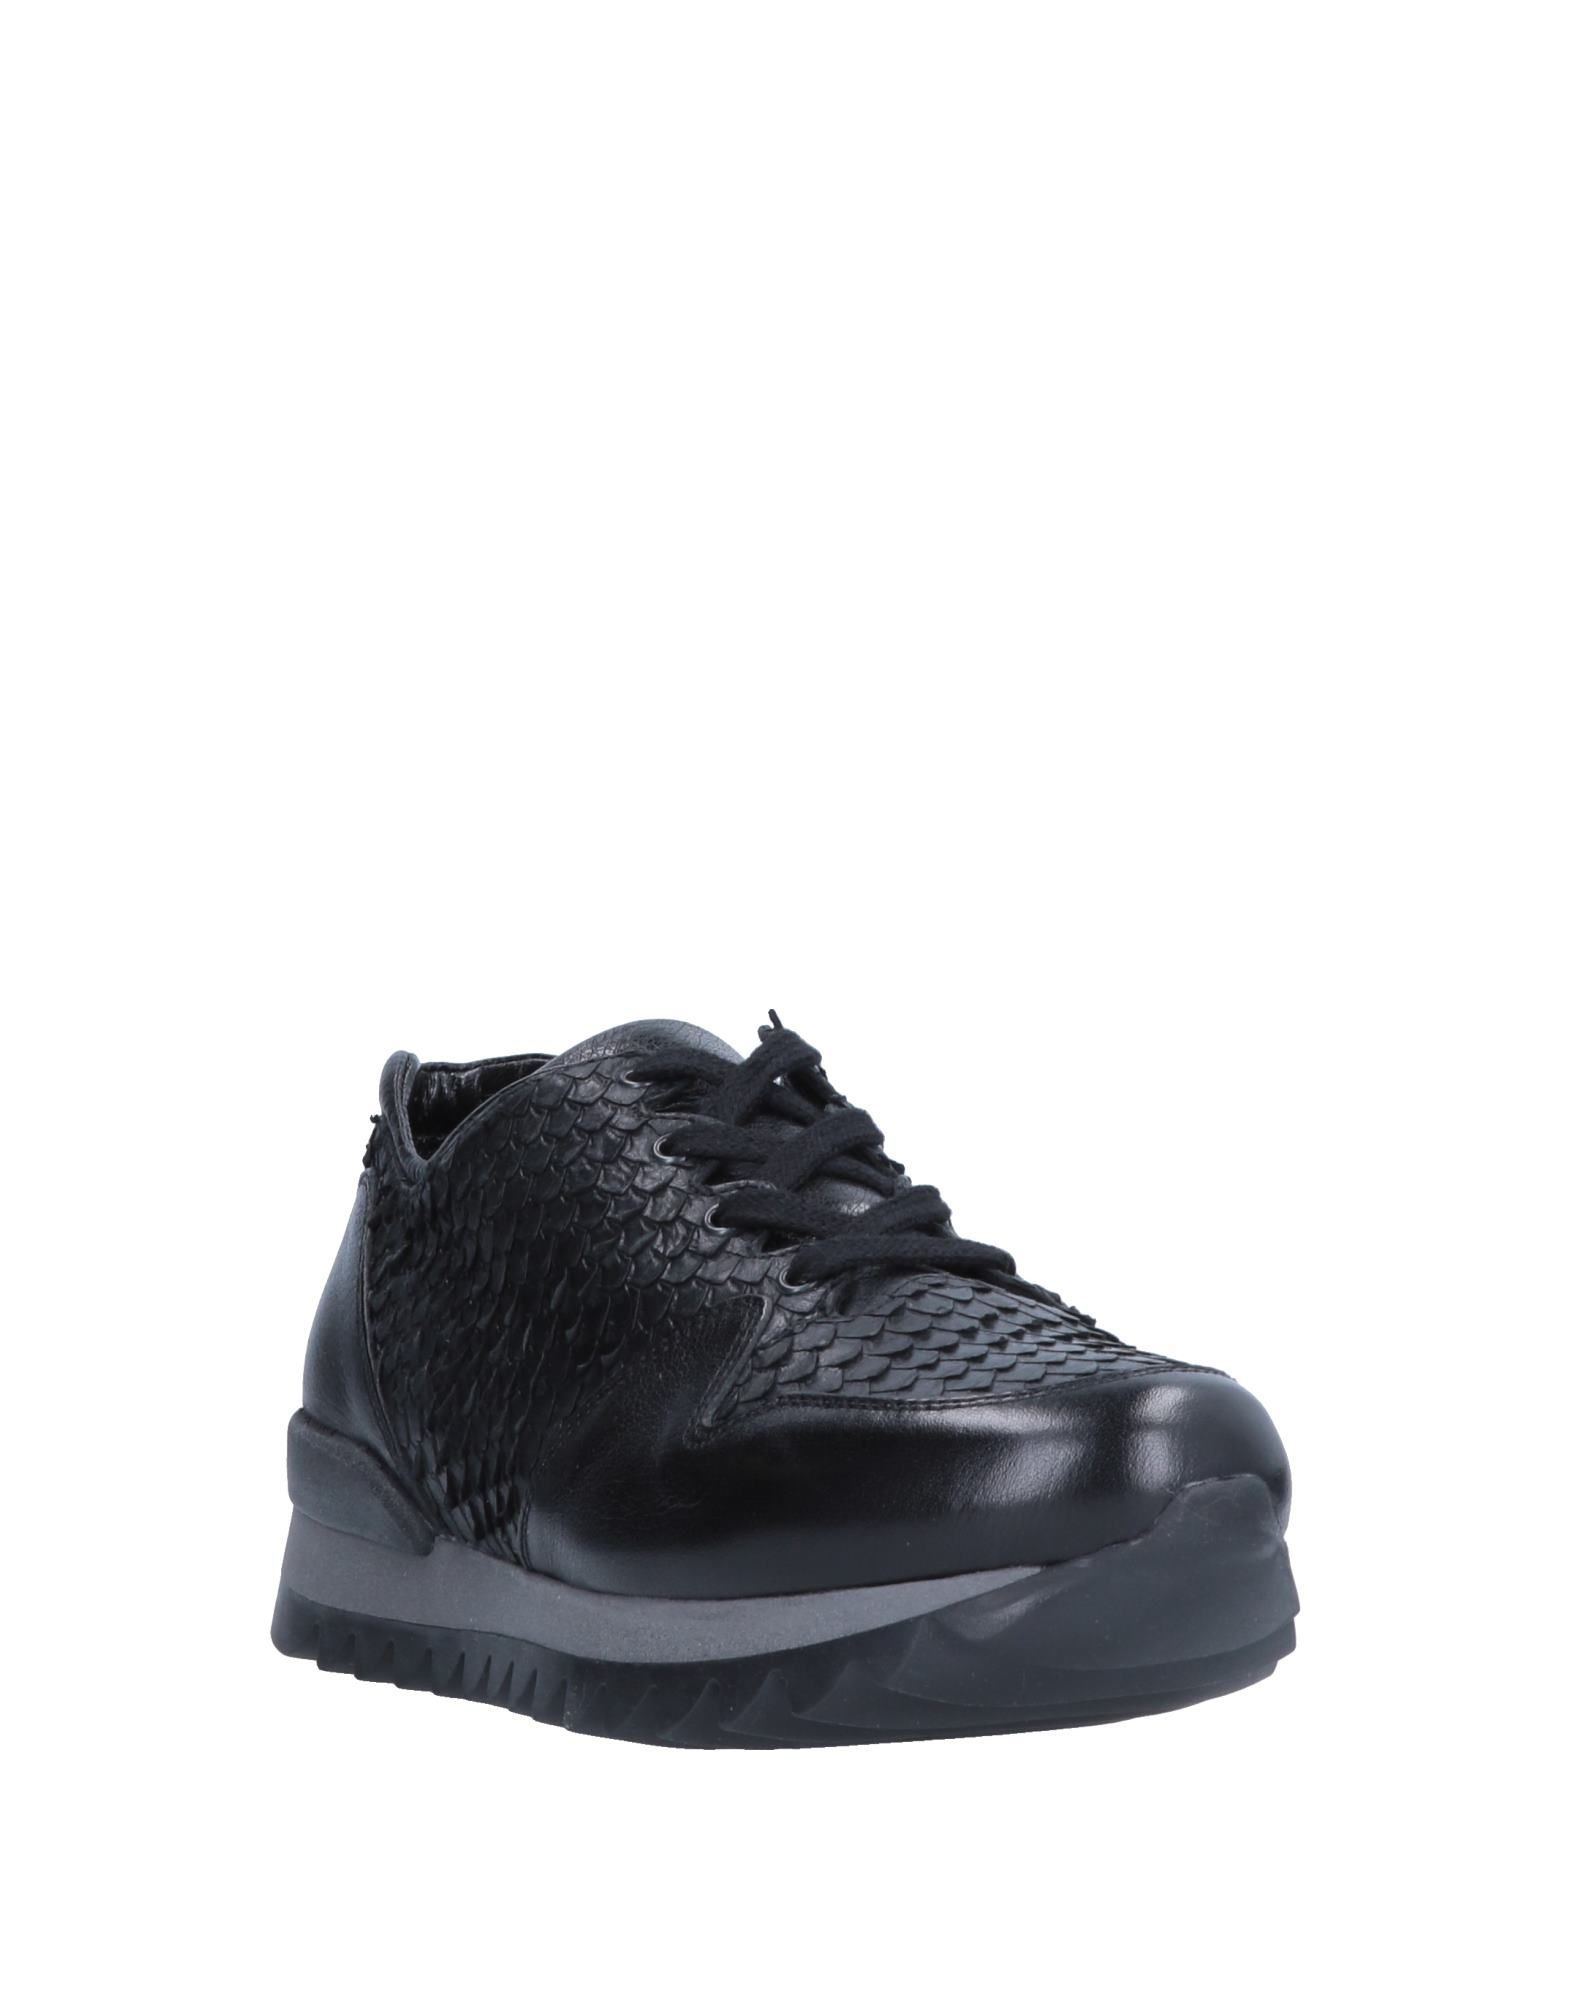 Gut um Bellariva billige Schuhe zu tragenLaura Bellariva um Sneakers Damen  11546219VK 432a44